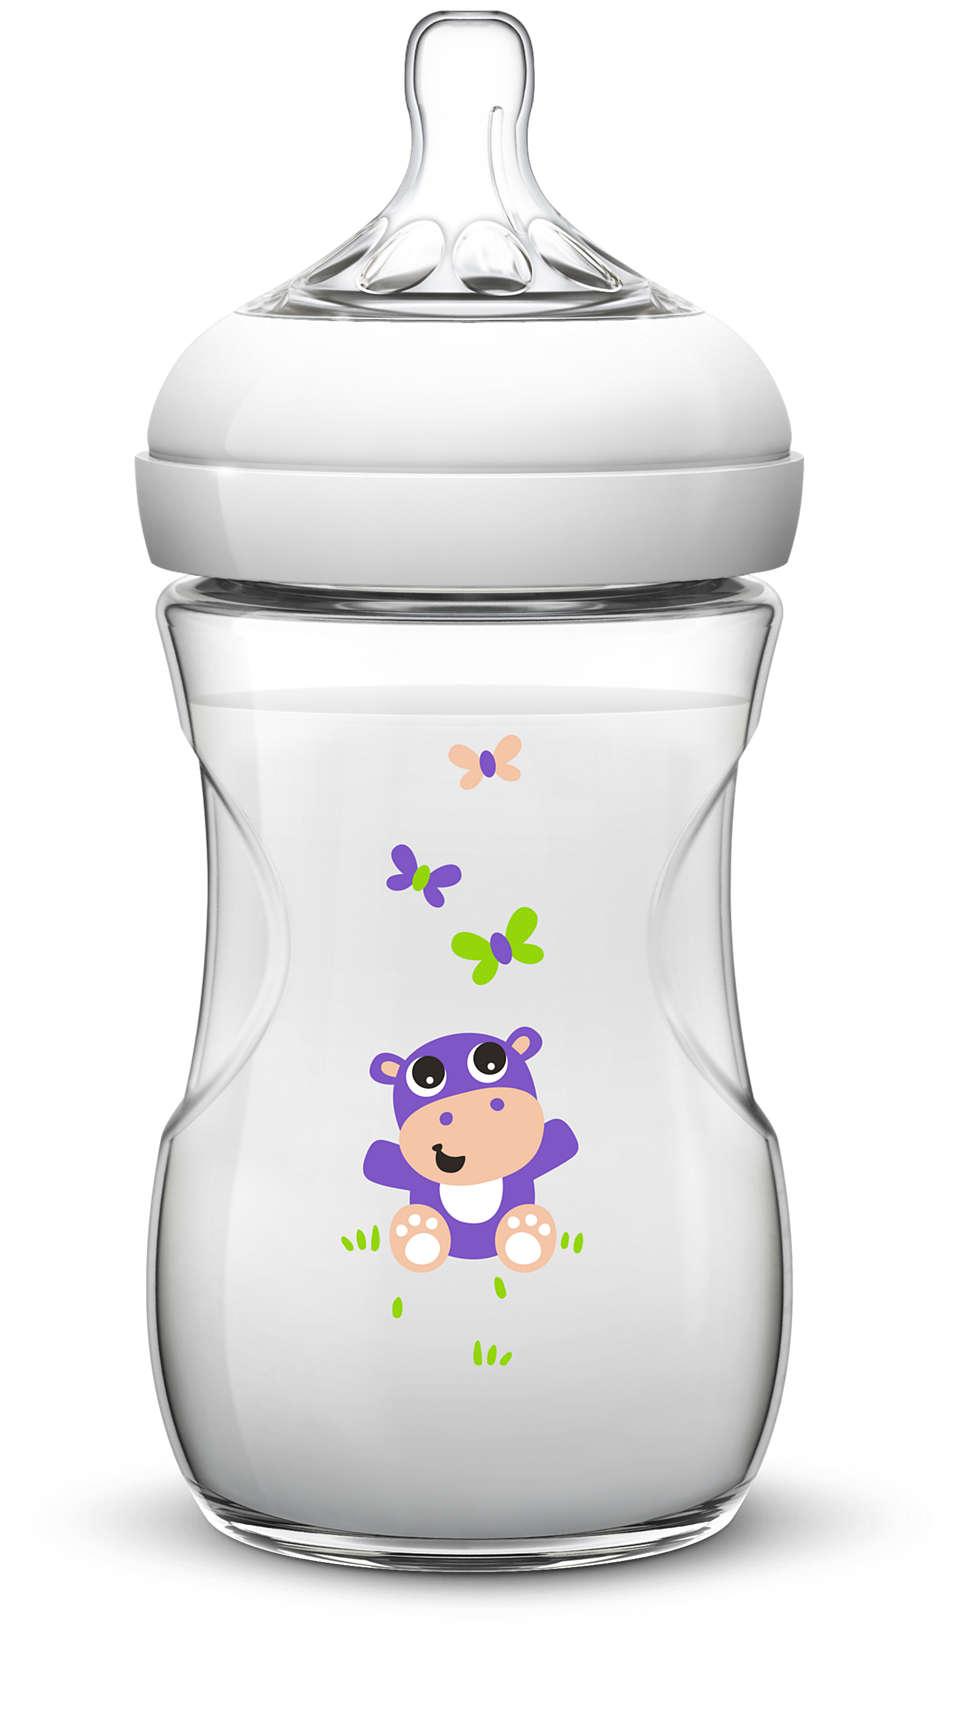 Najbardziej naturalny sposób karmienia butelką